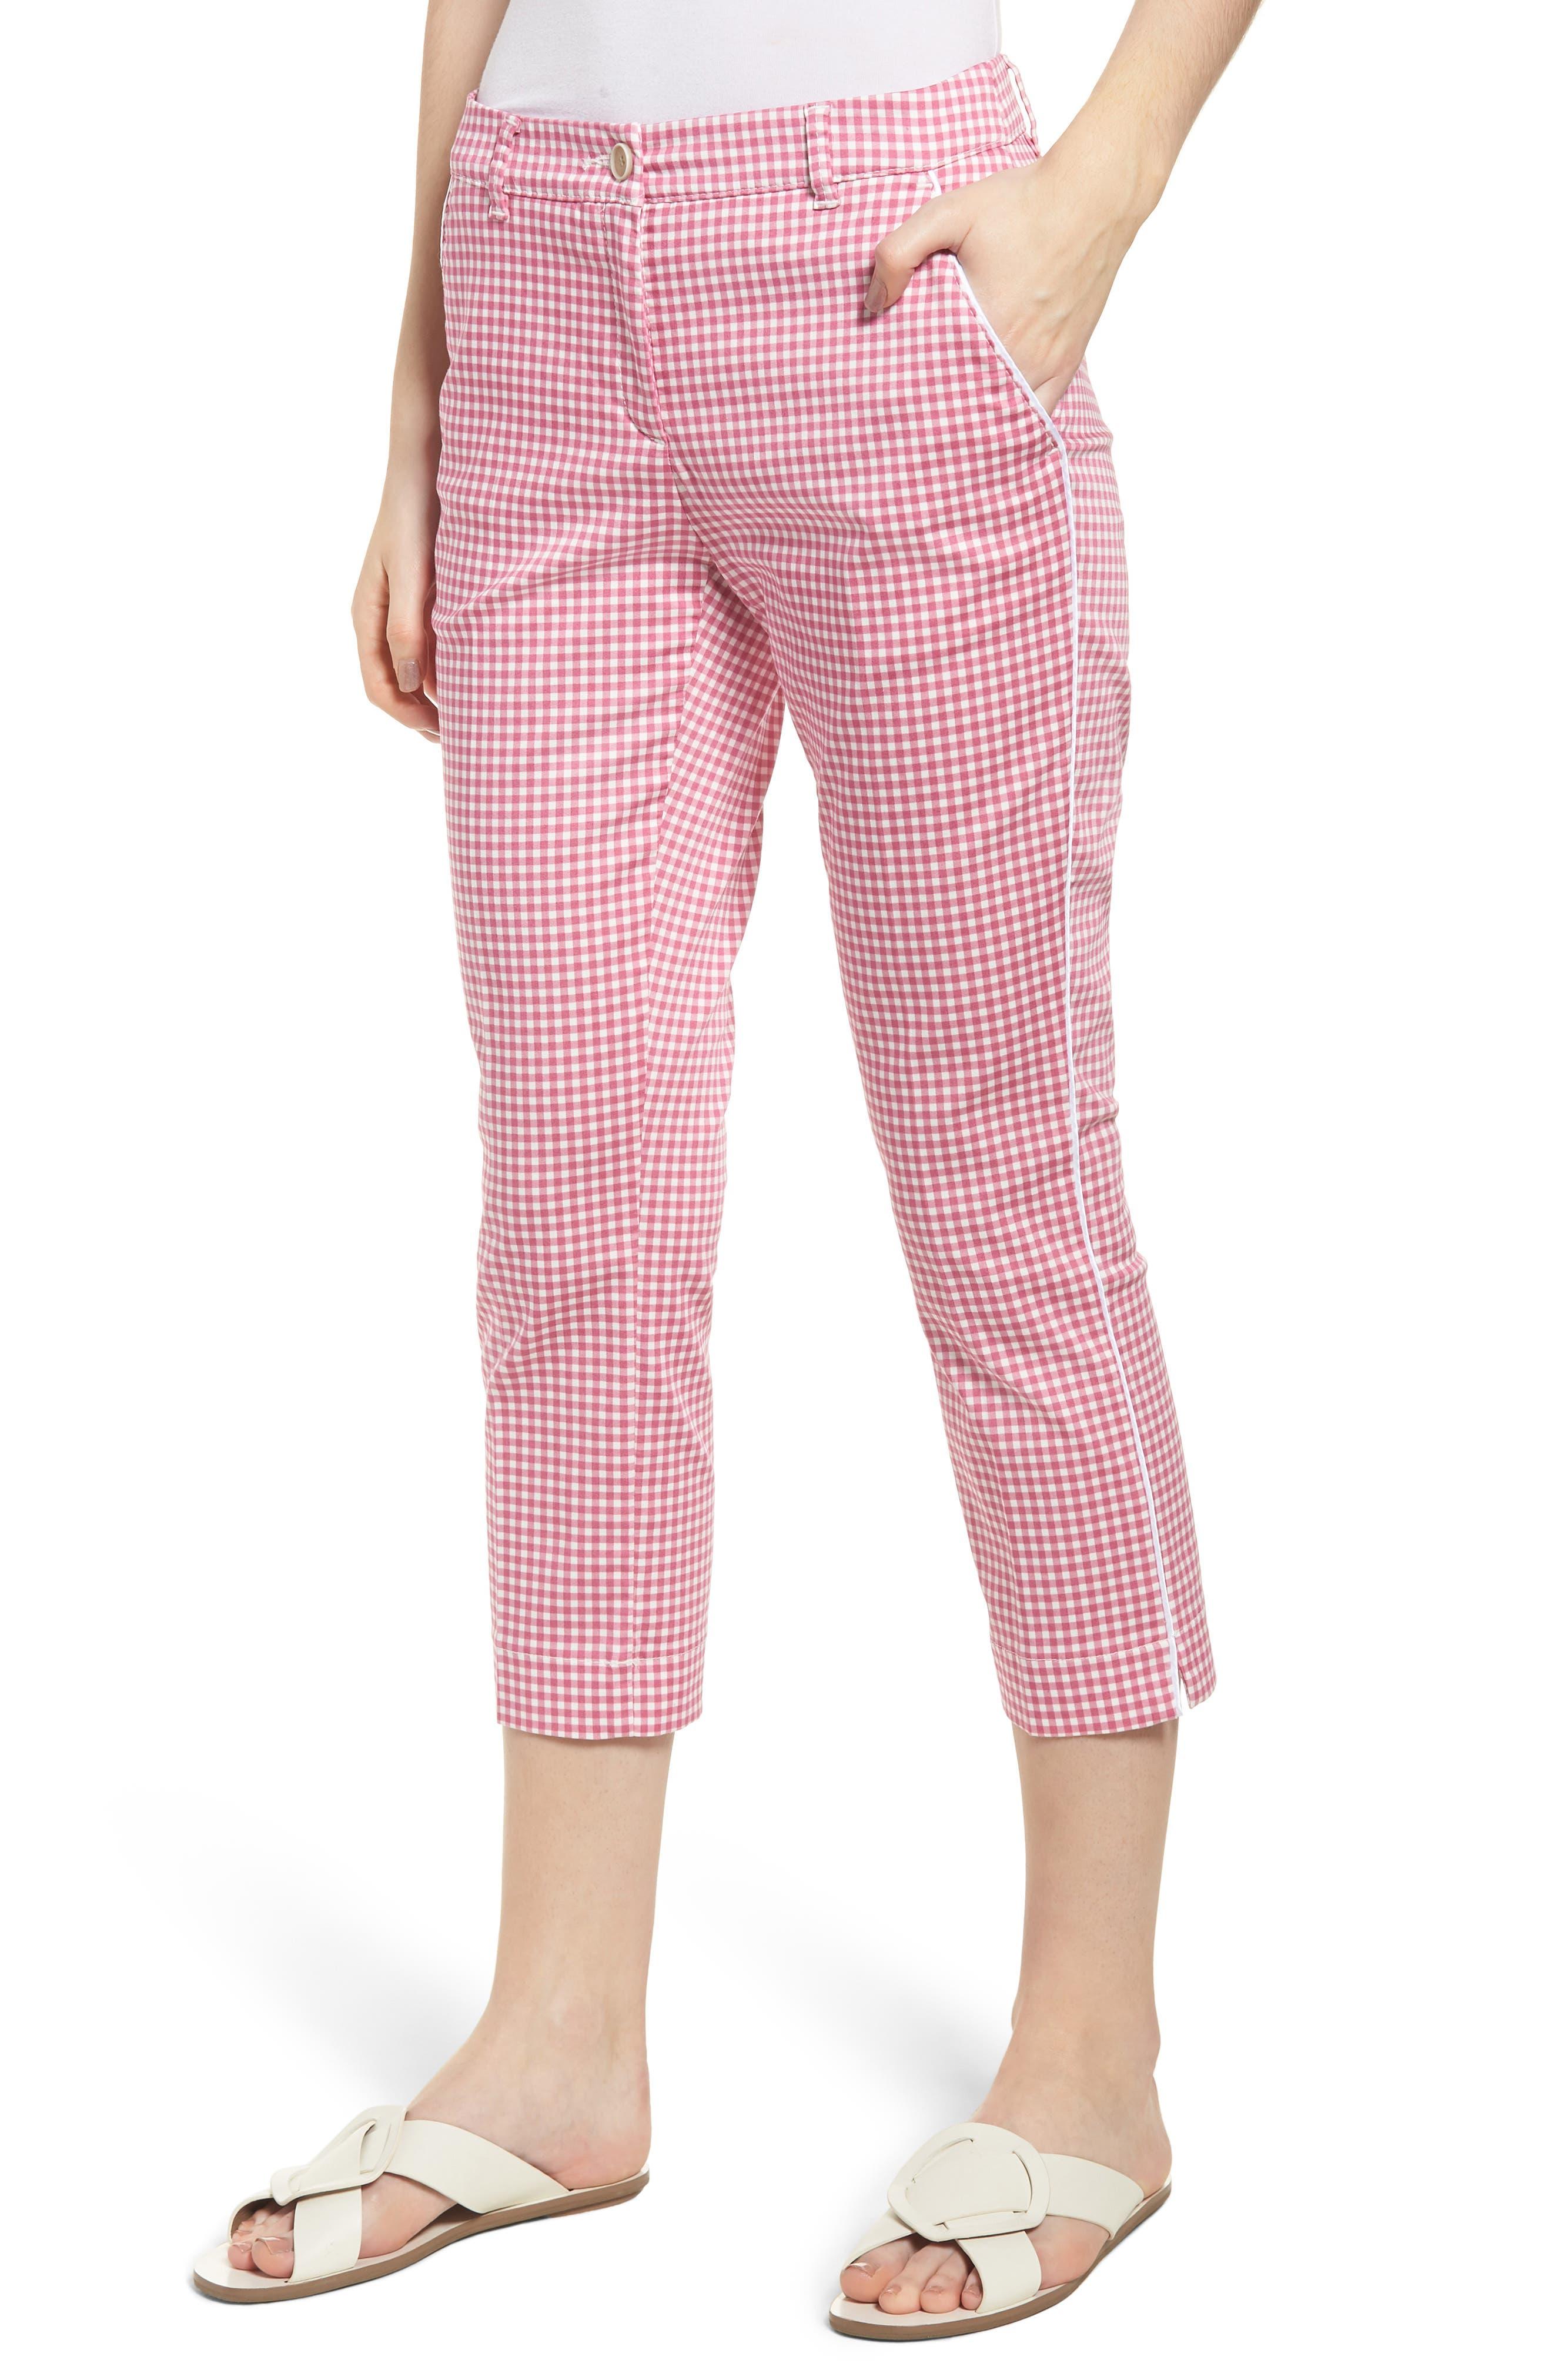 Maron Gingham Stretch Cotton Pants,                         Main,                         color,